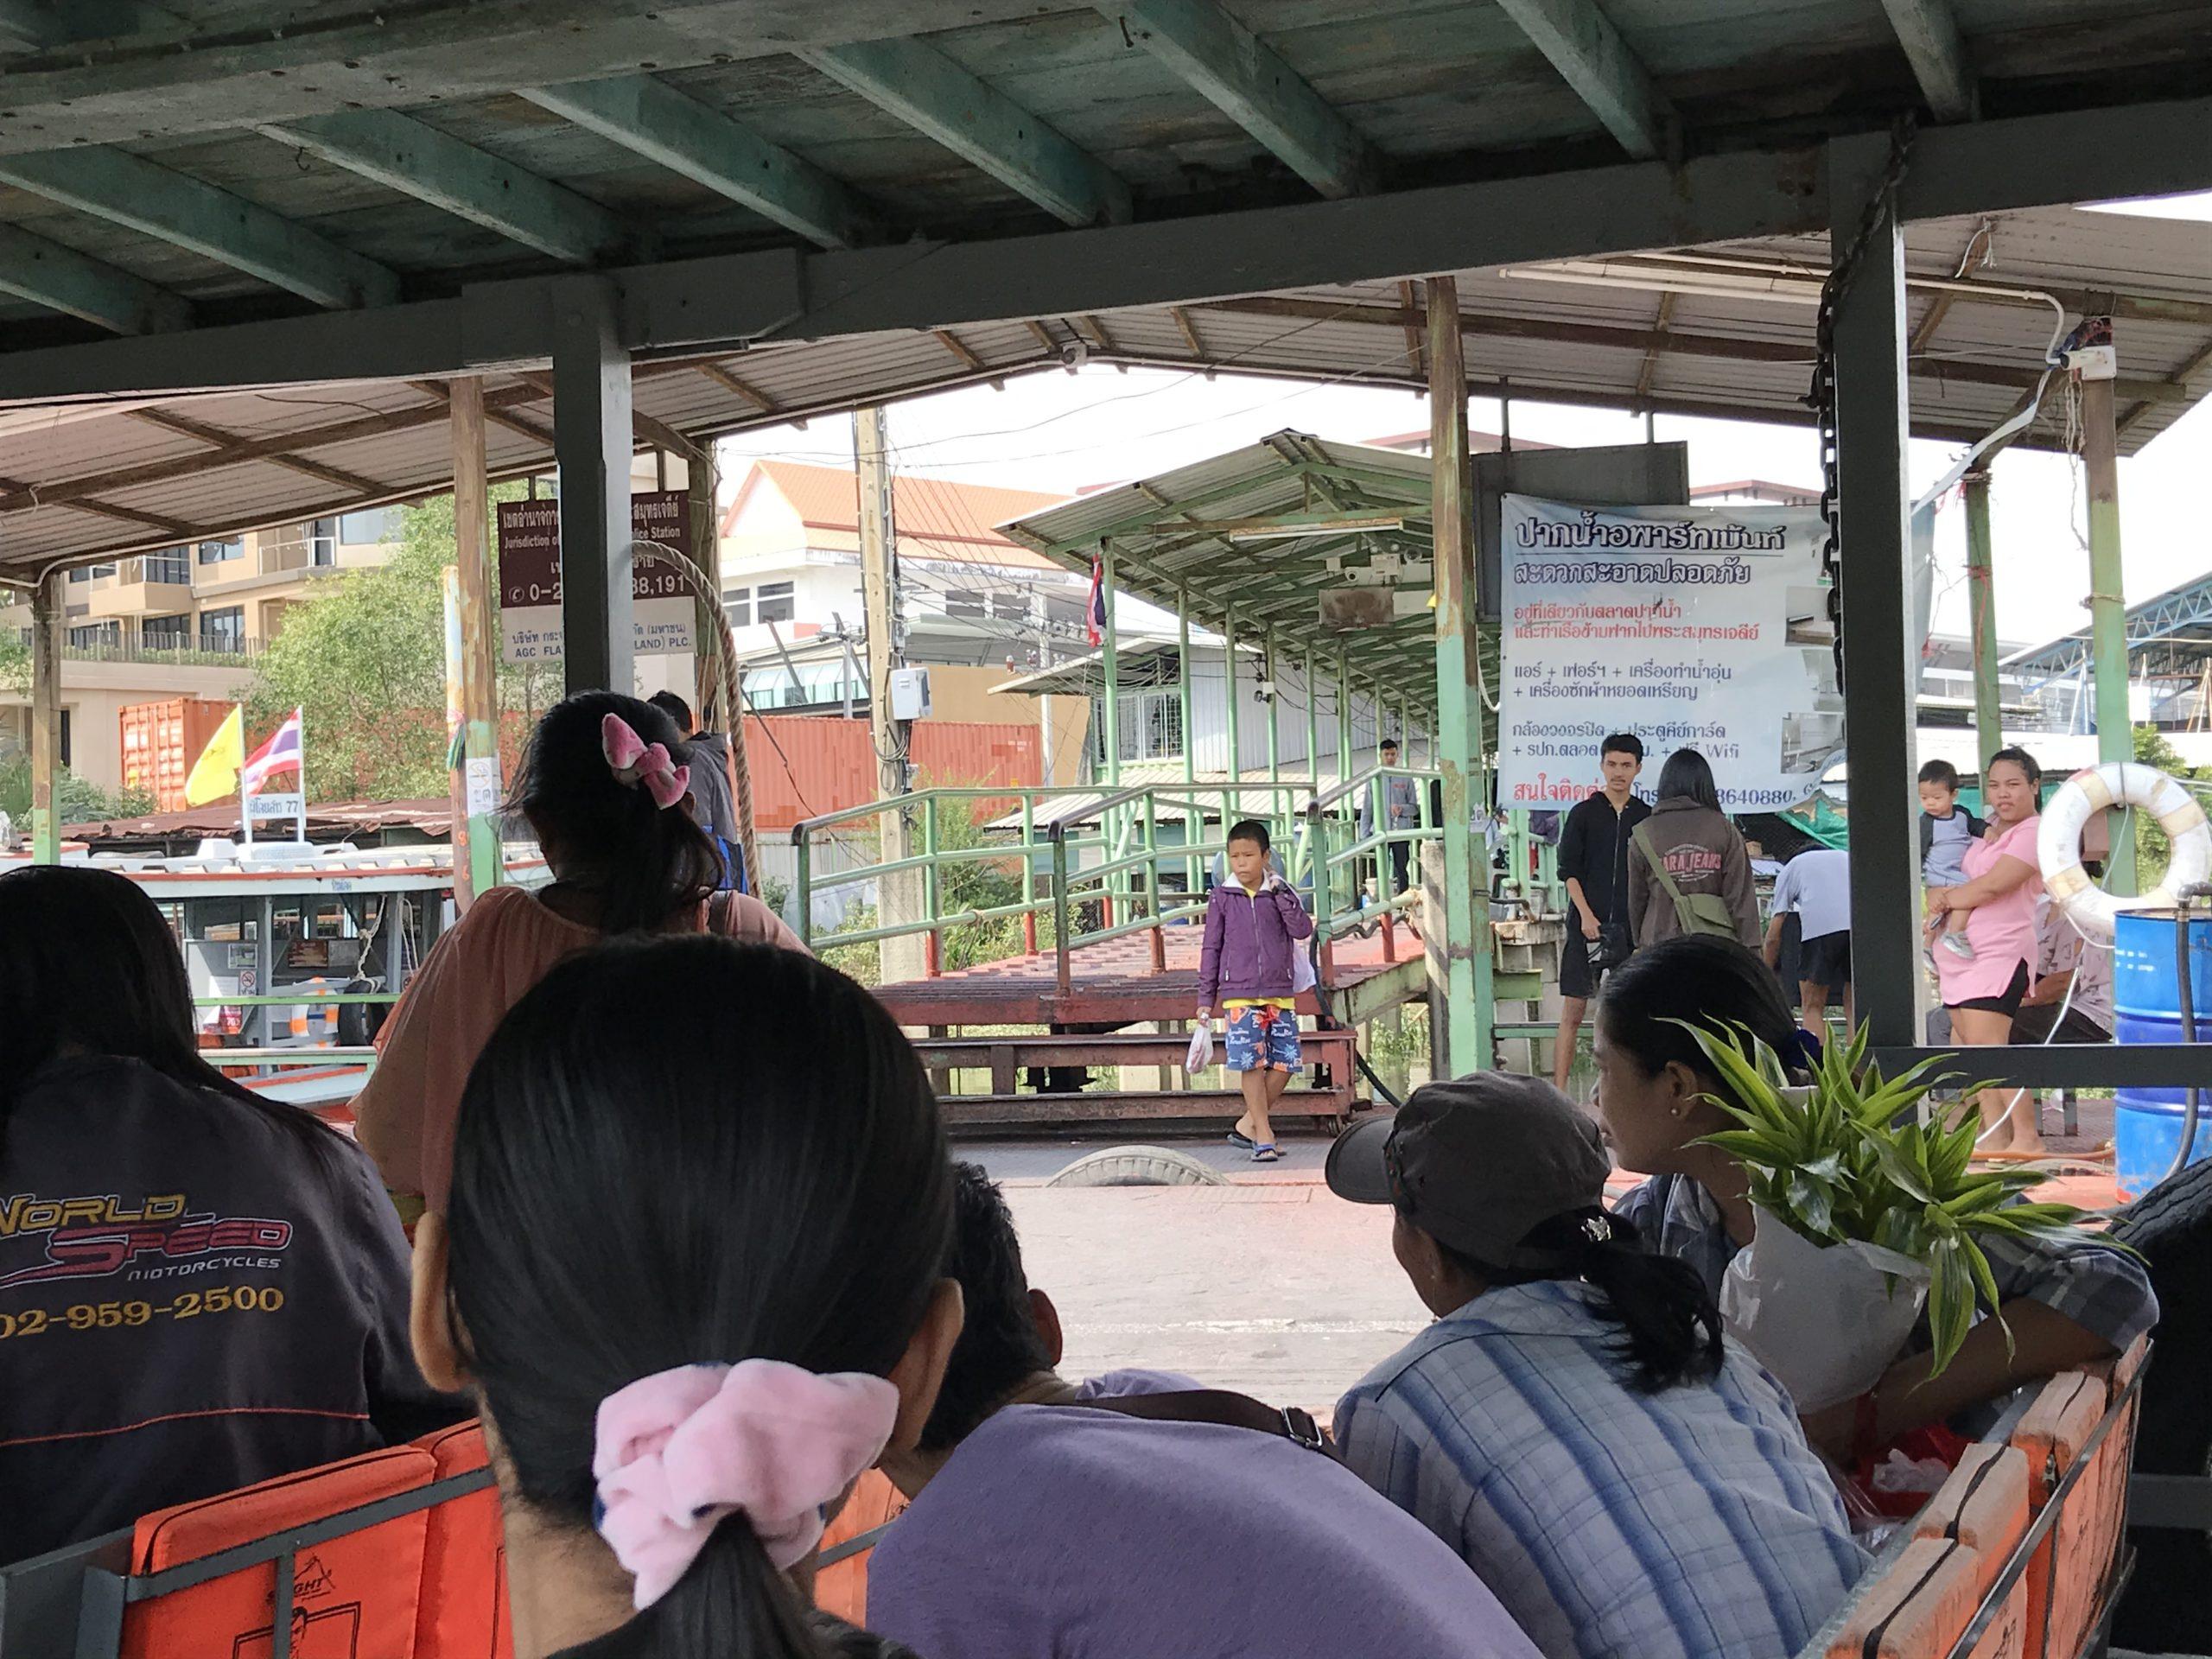 Phra samut chedi寺院 渡船